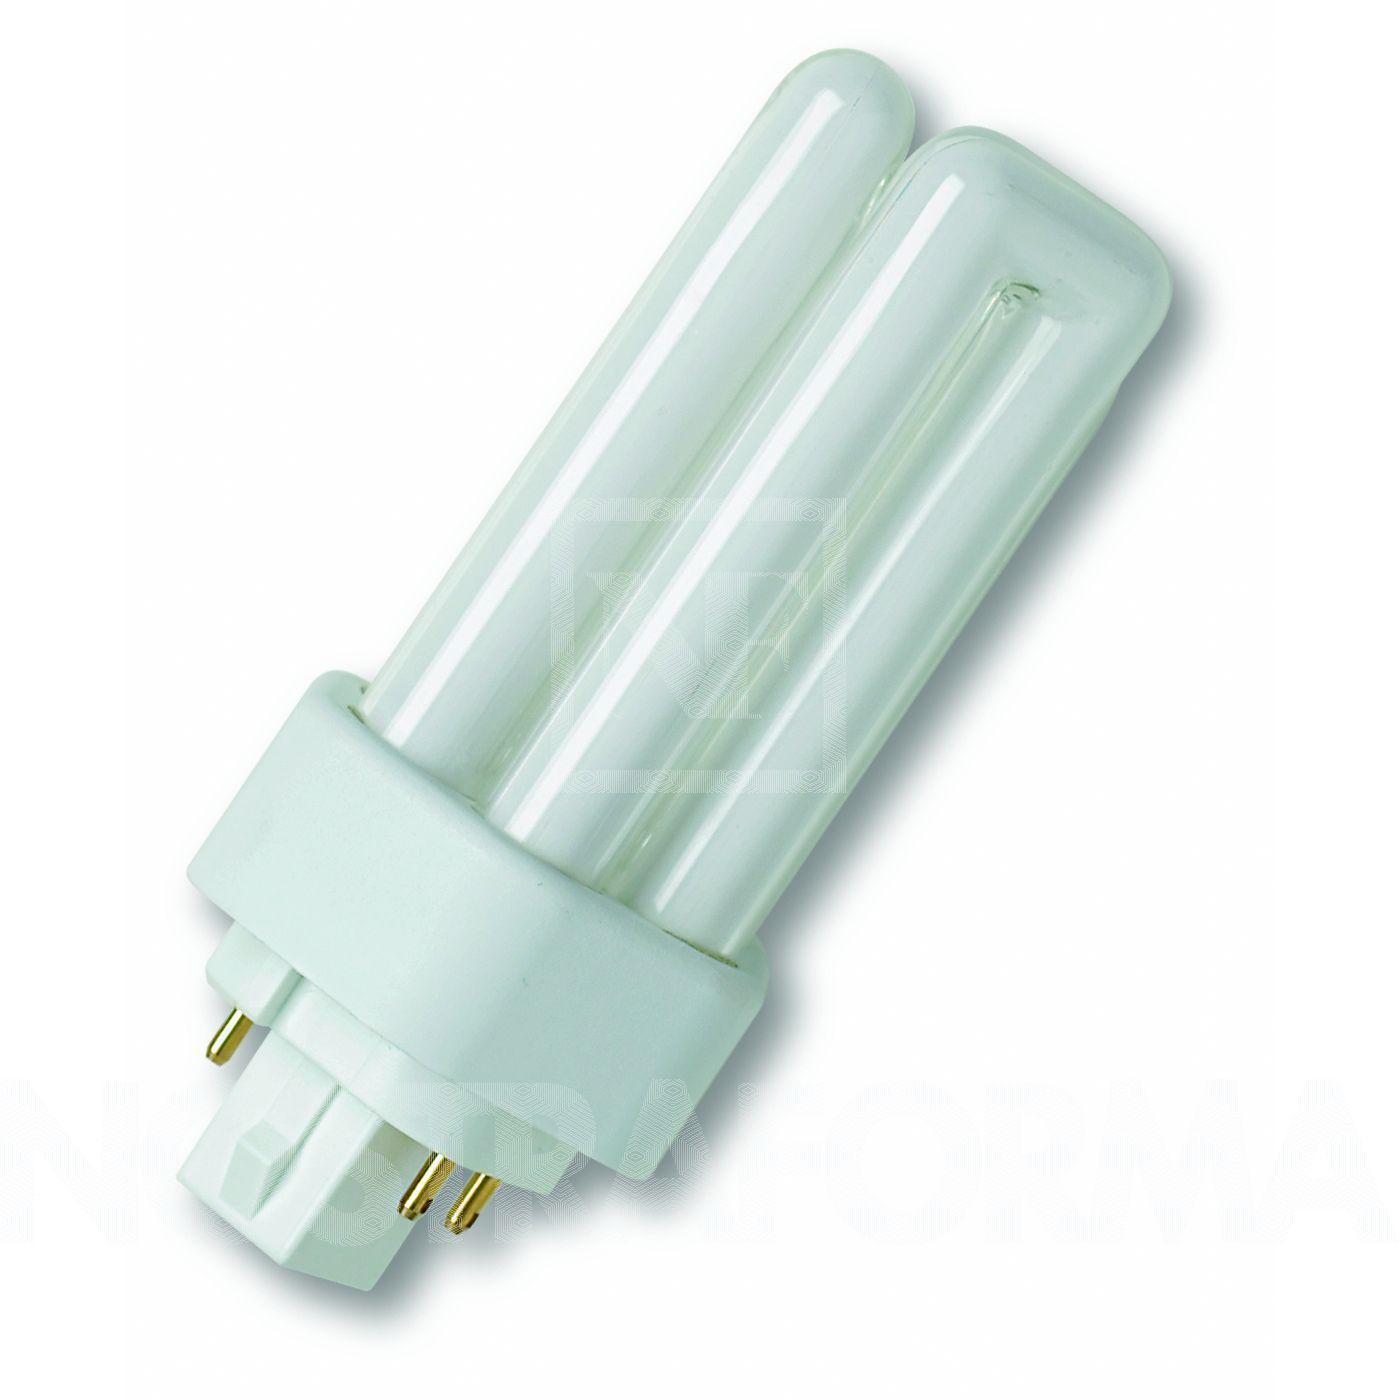 Osram Kompaktleuchtstofflampe Dreifach-Doppelrohr TC-TEL 18W/827 GX24q-2 warmweiß extra